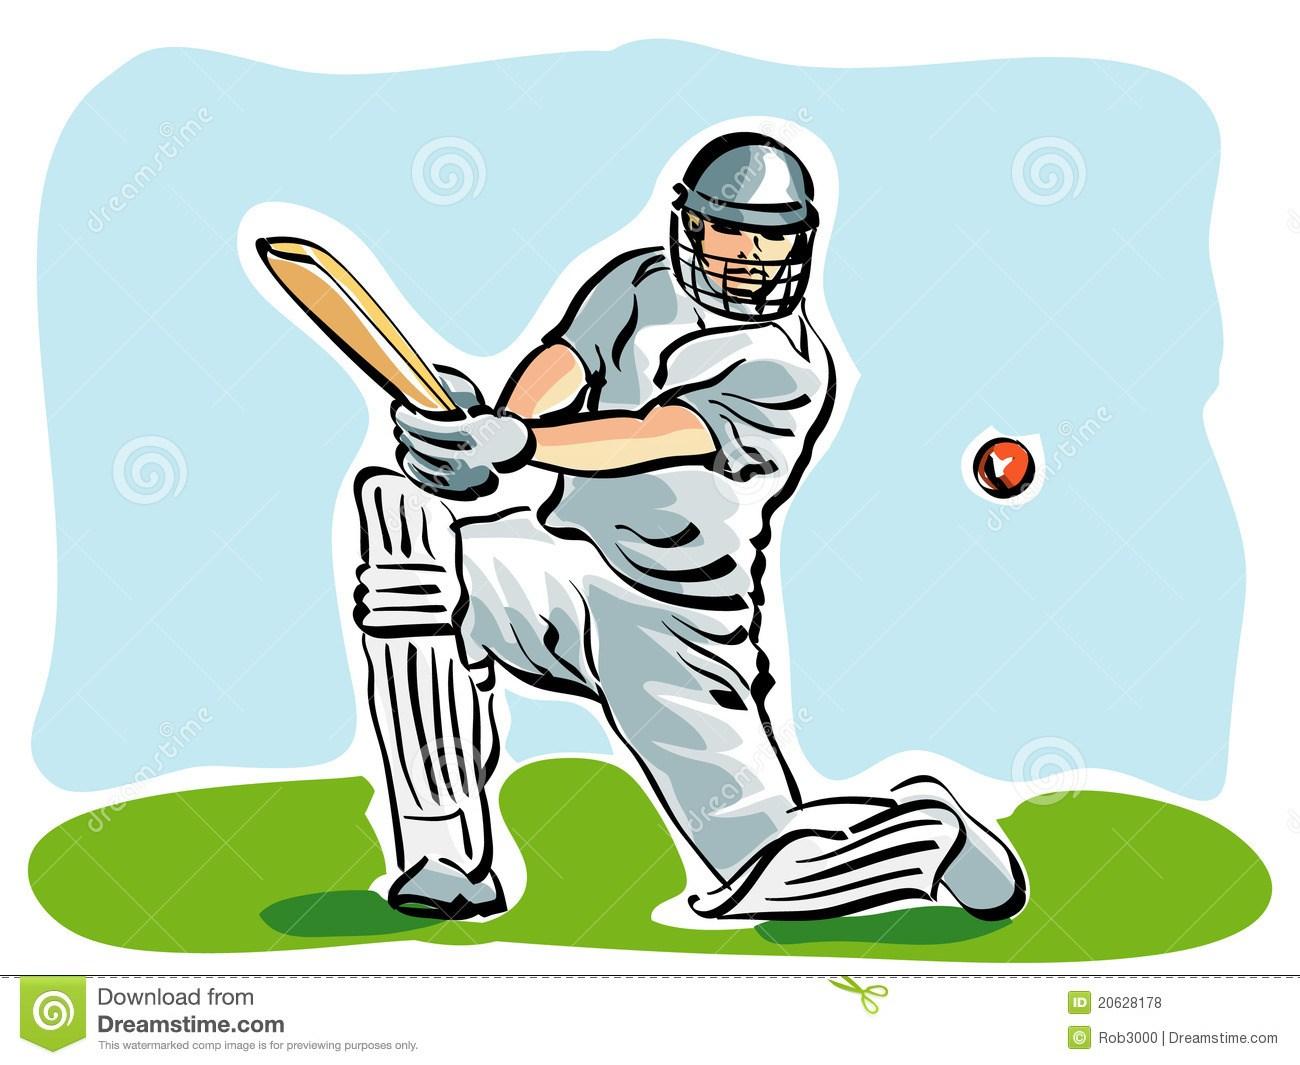 Cricket clipart images 5 » Clipart Portal.